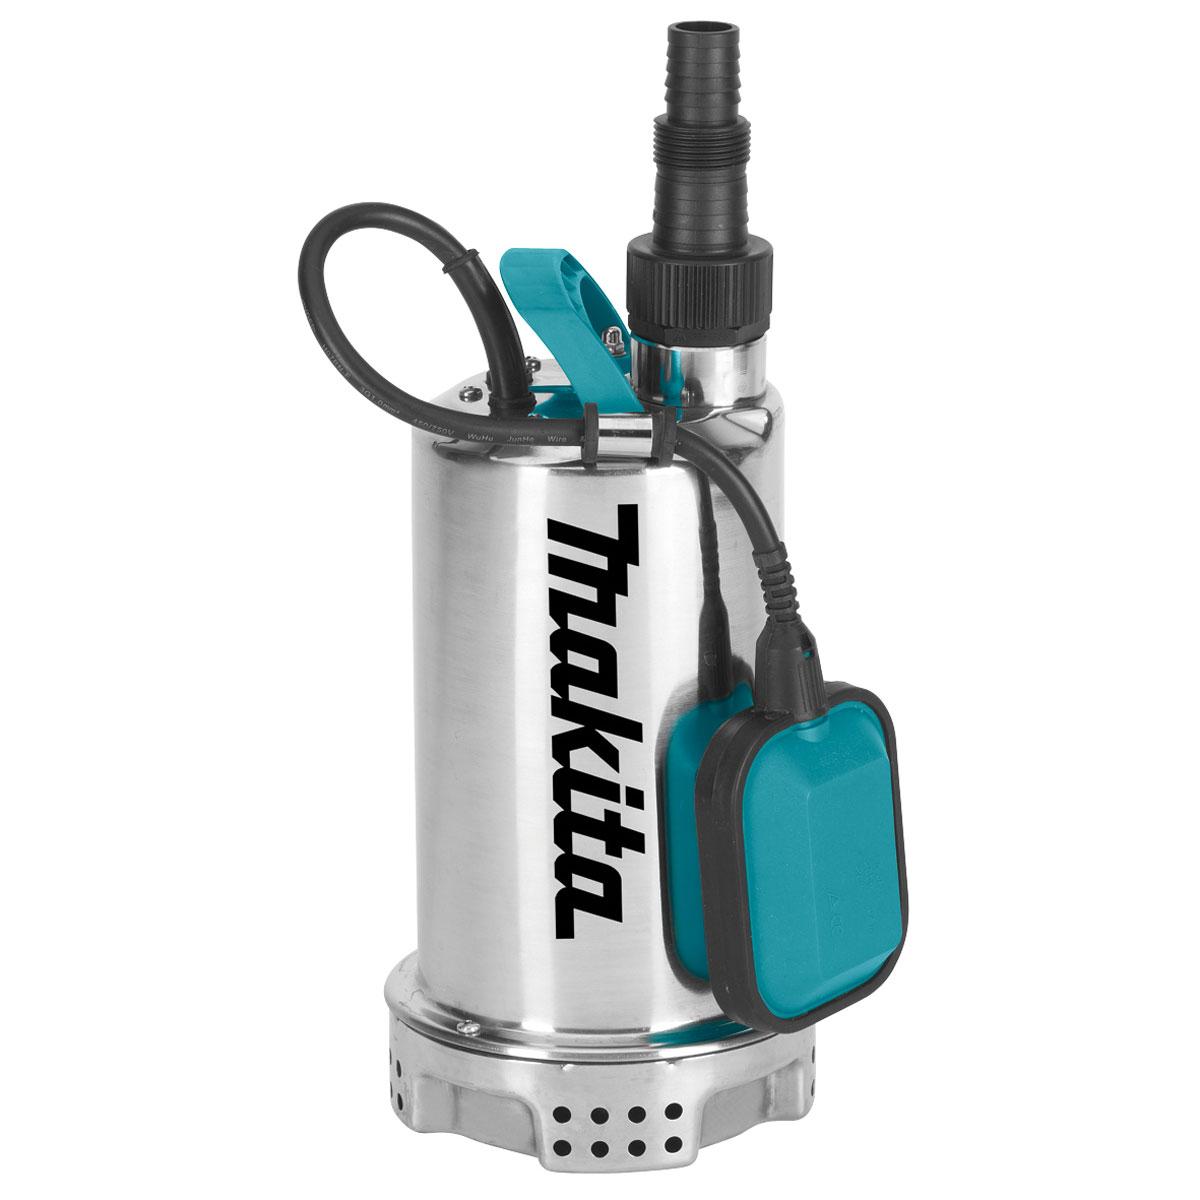 Makita PF1100 potopna pumpa za čistu vodu